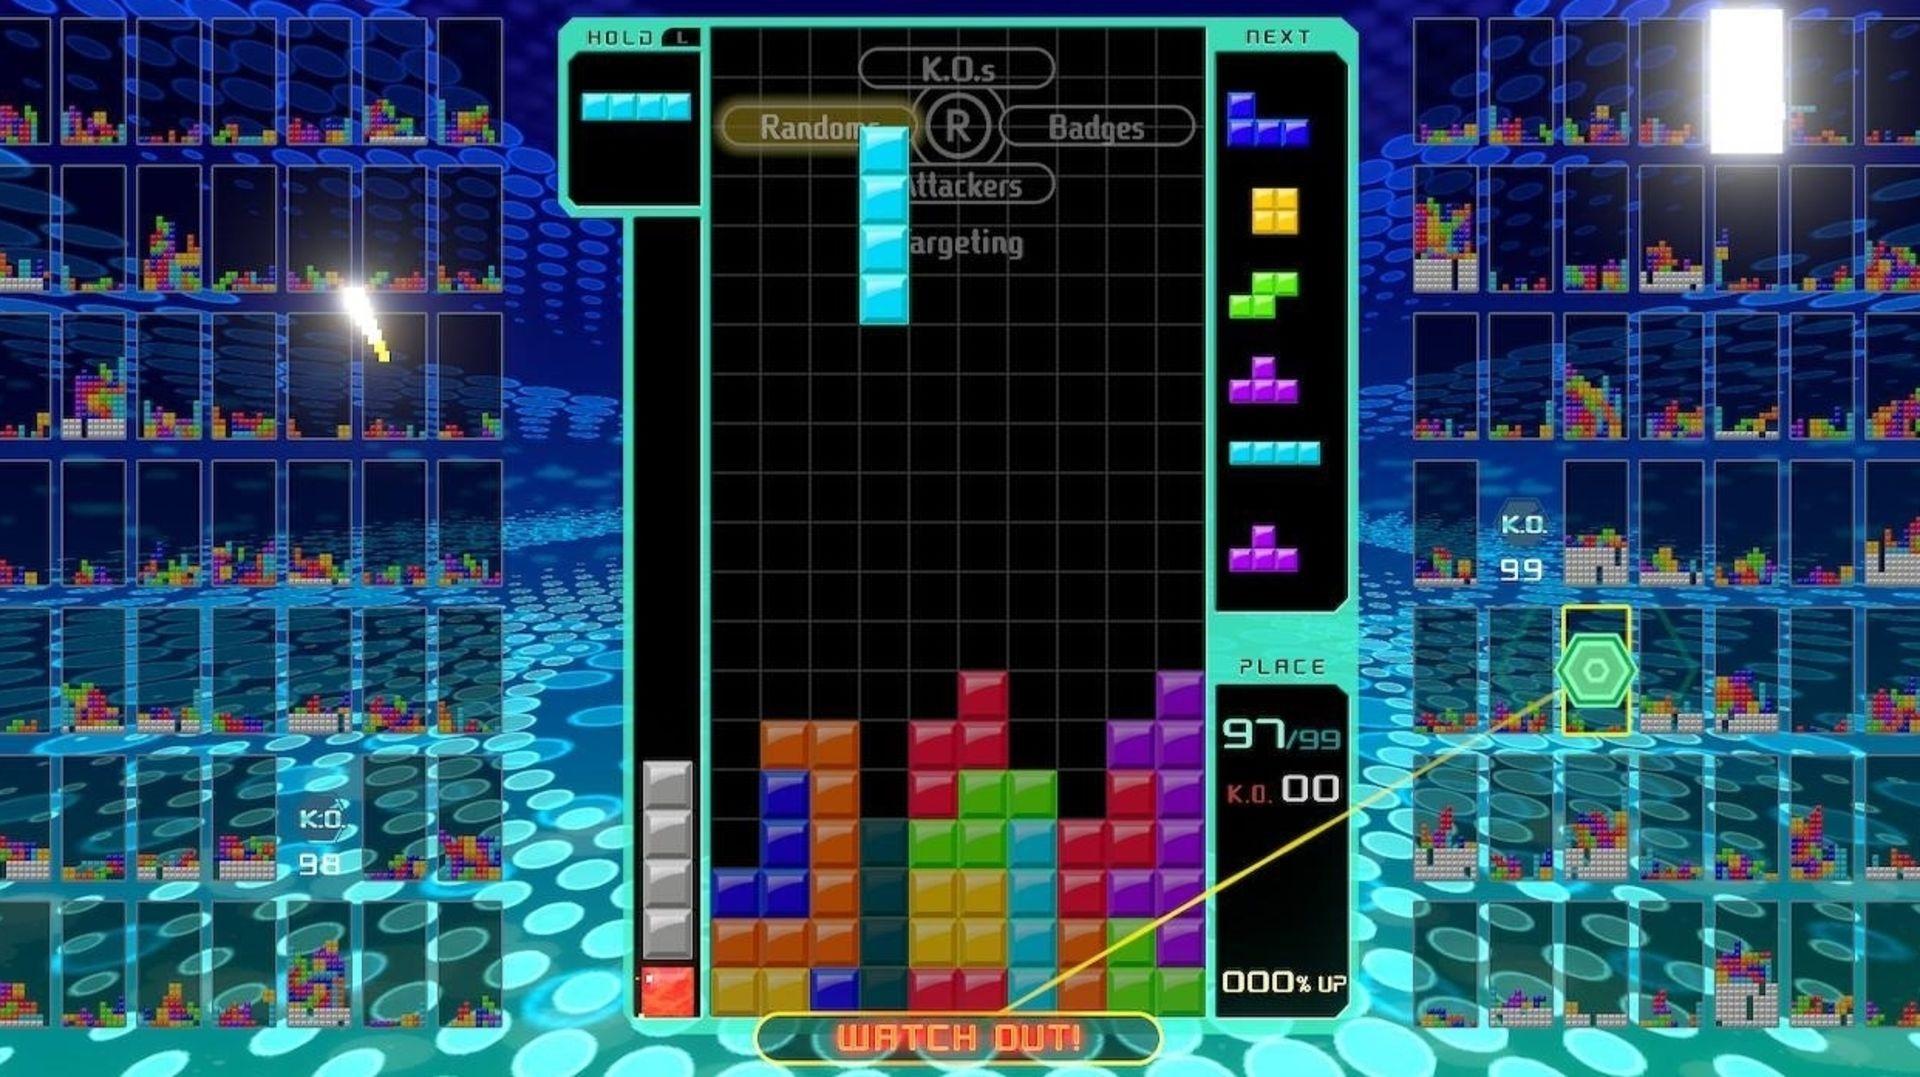 Tetris 99 | The 10 Best Video Games of 2019 | Gammicks